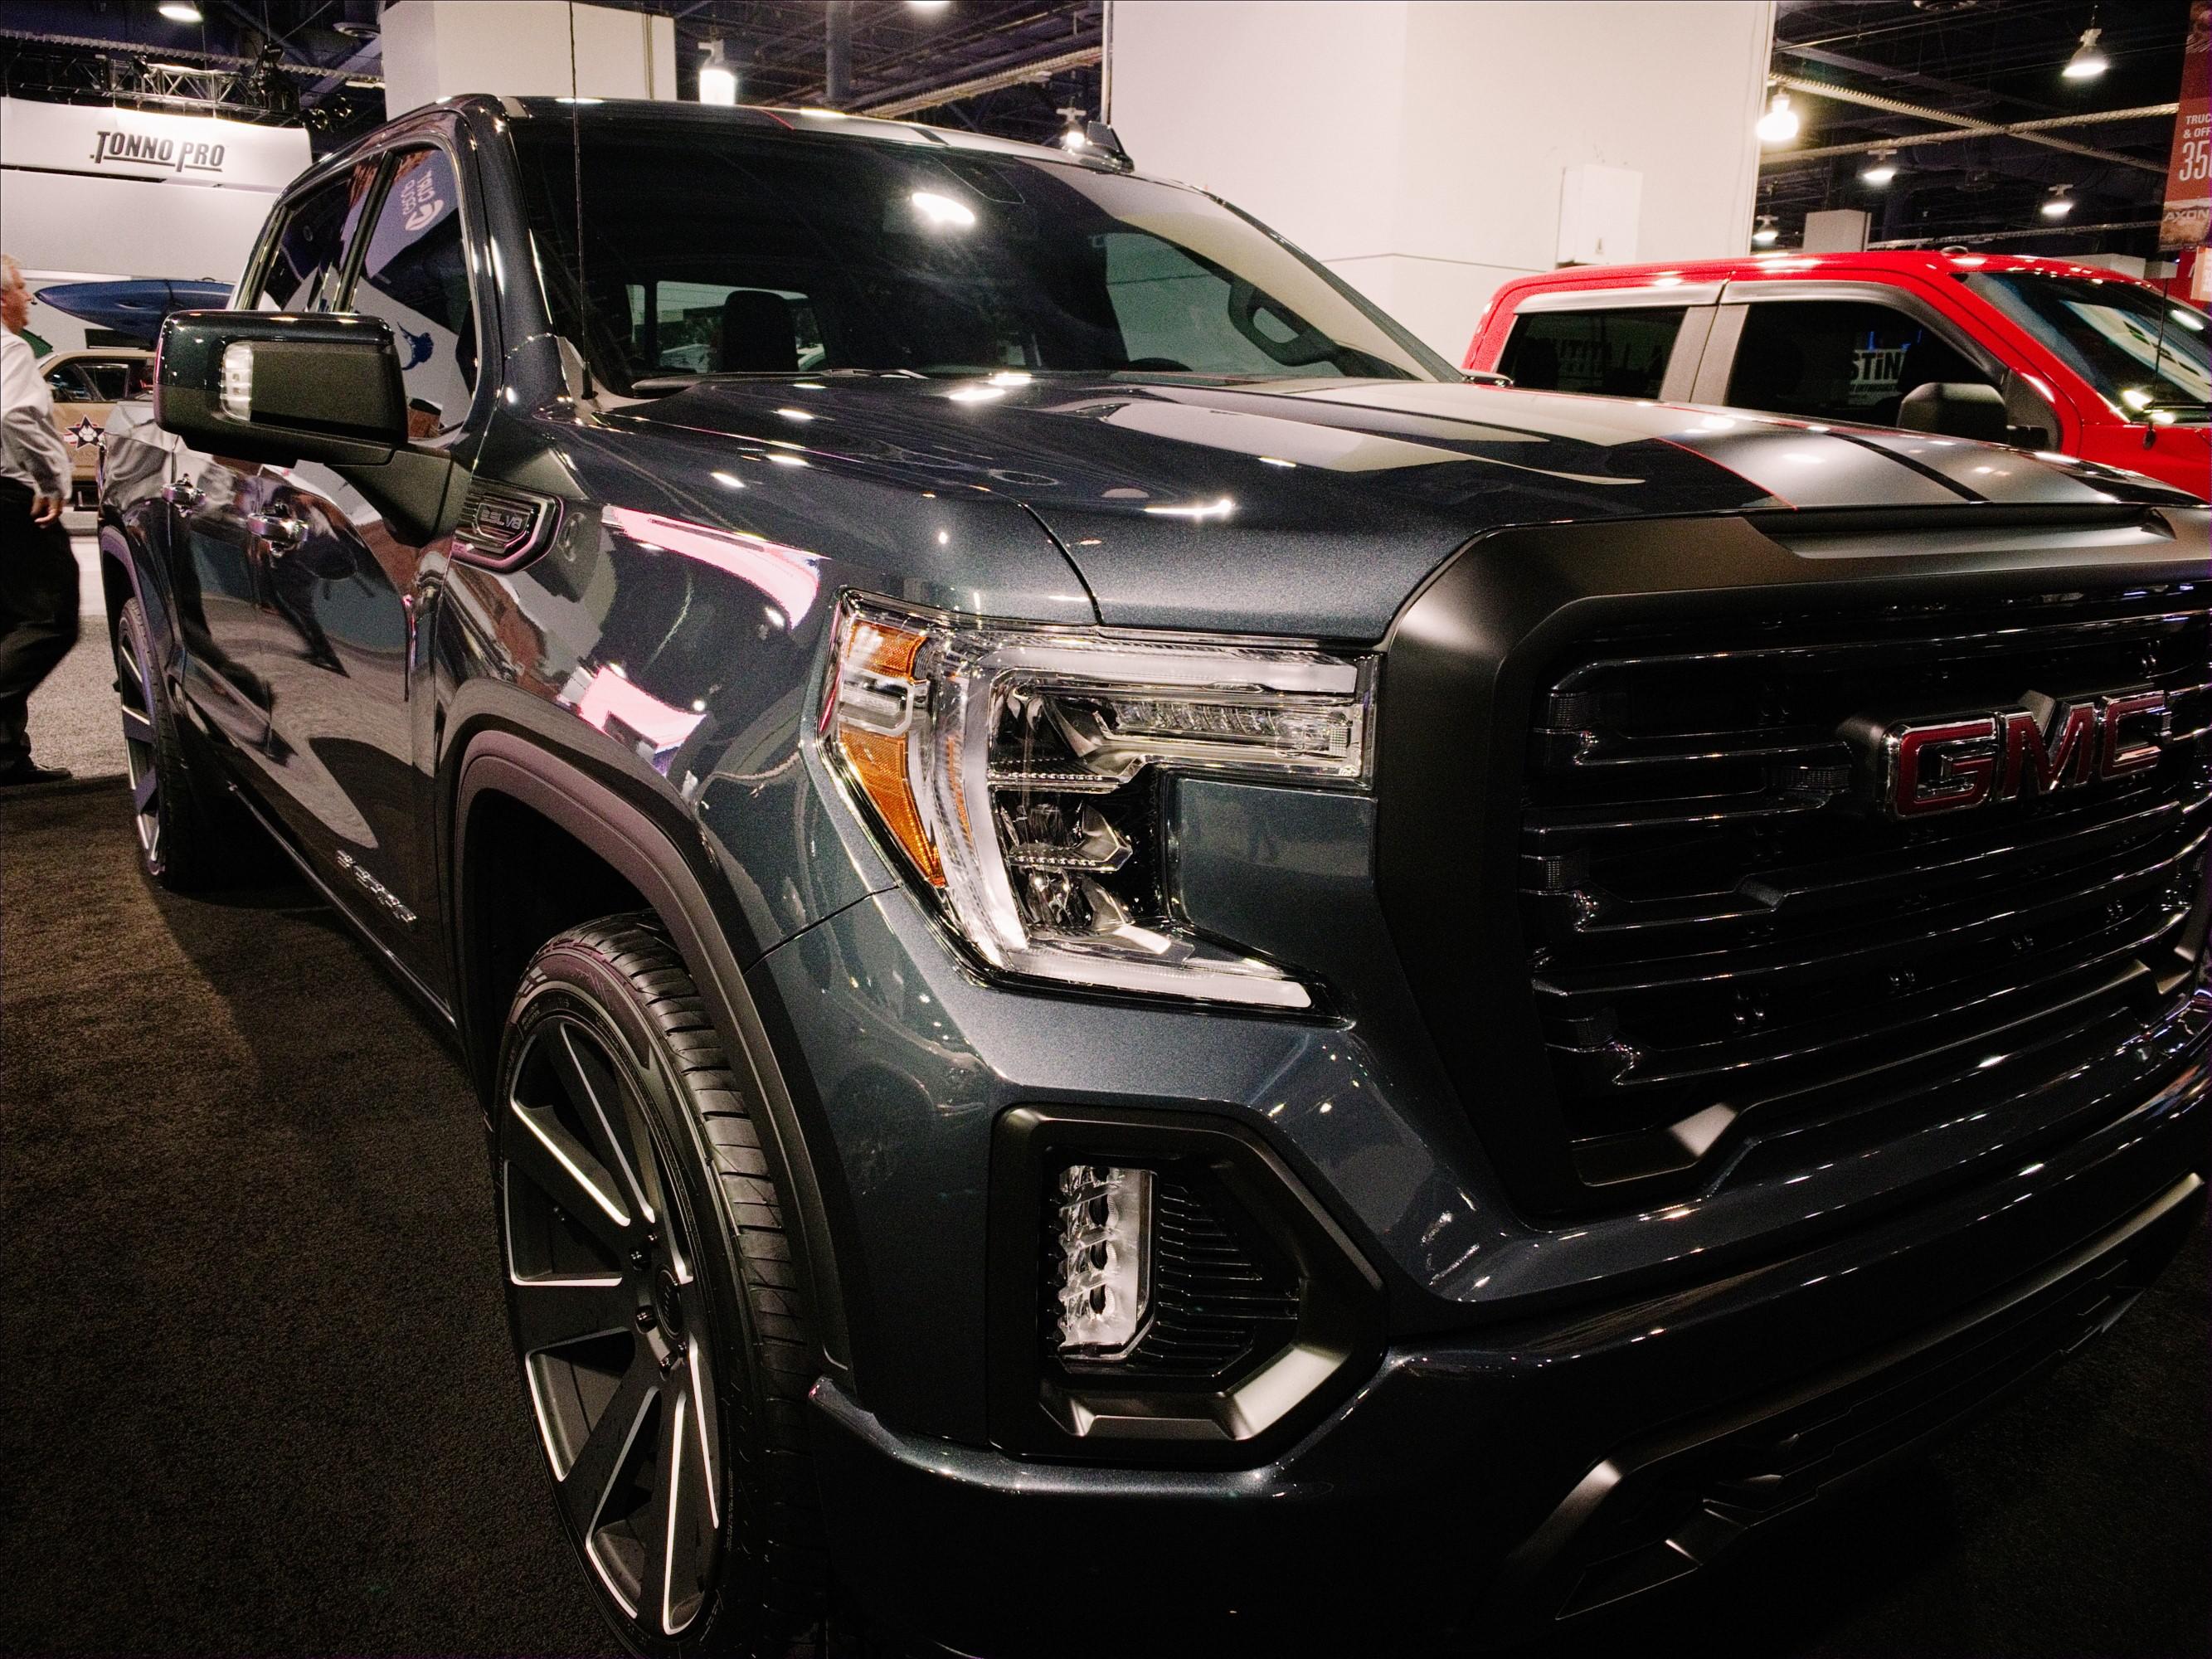 Sema 2018 Highlighting The Best Chevrolet And Gmc Trucks